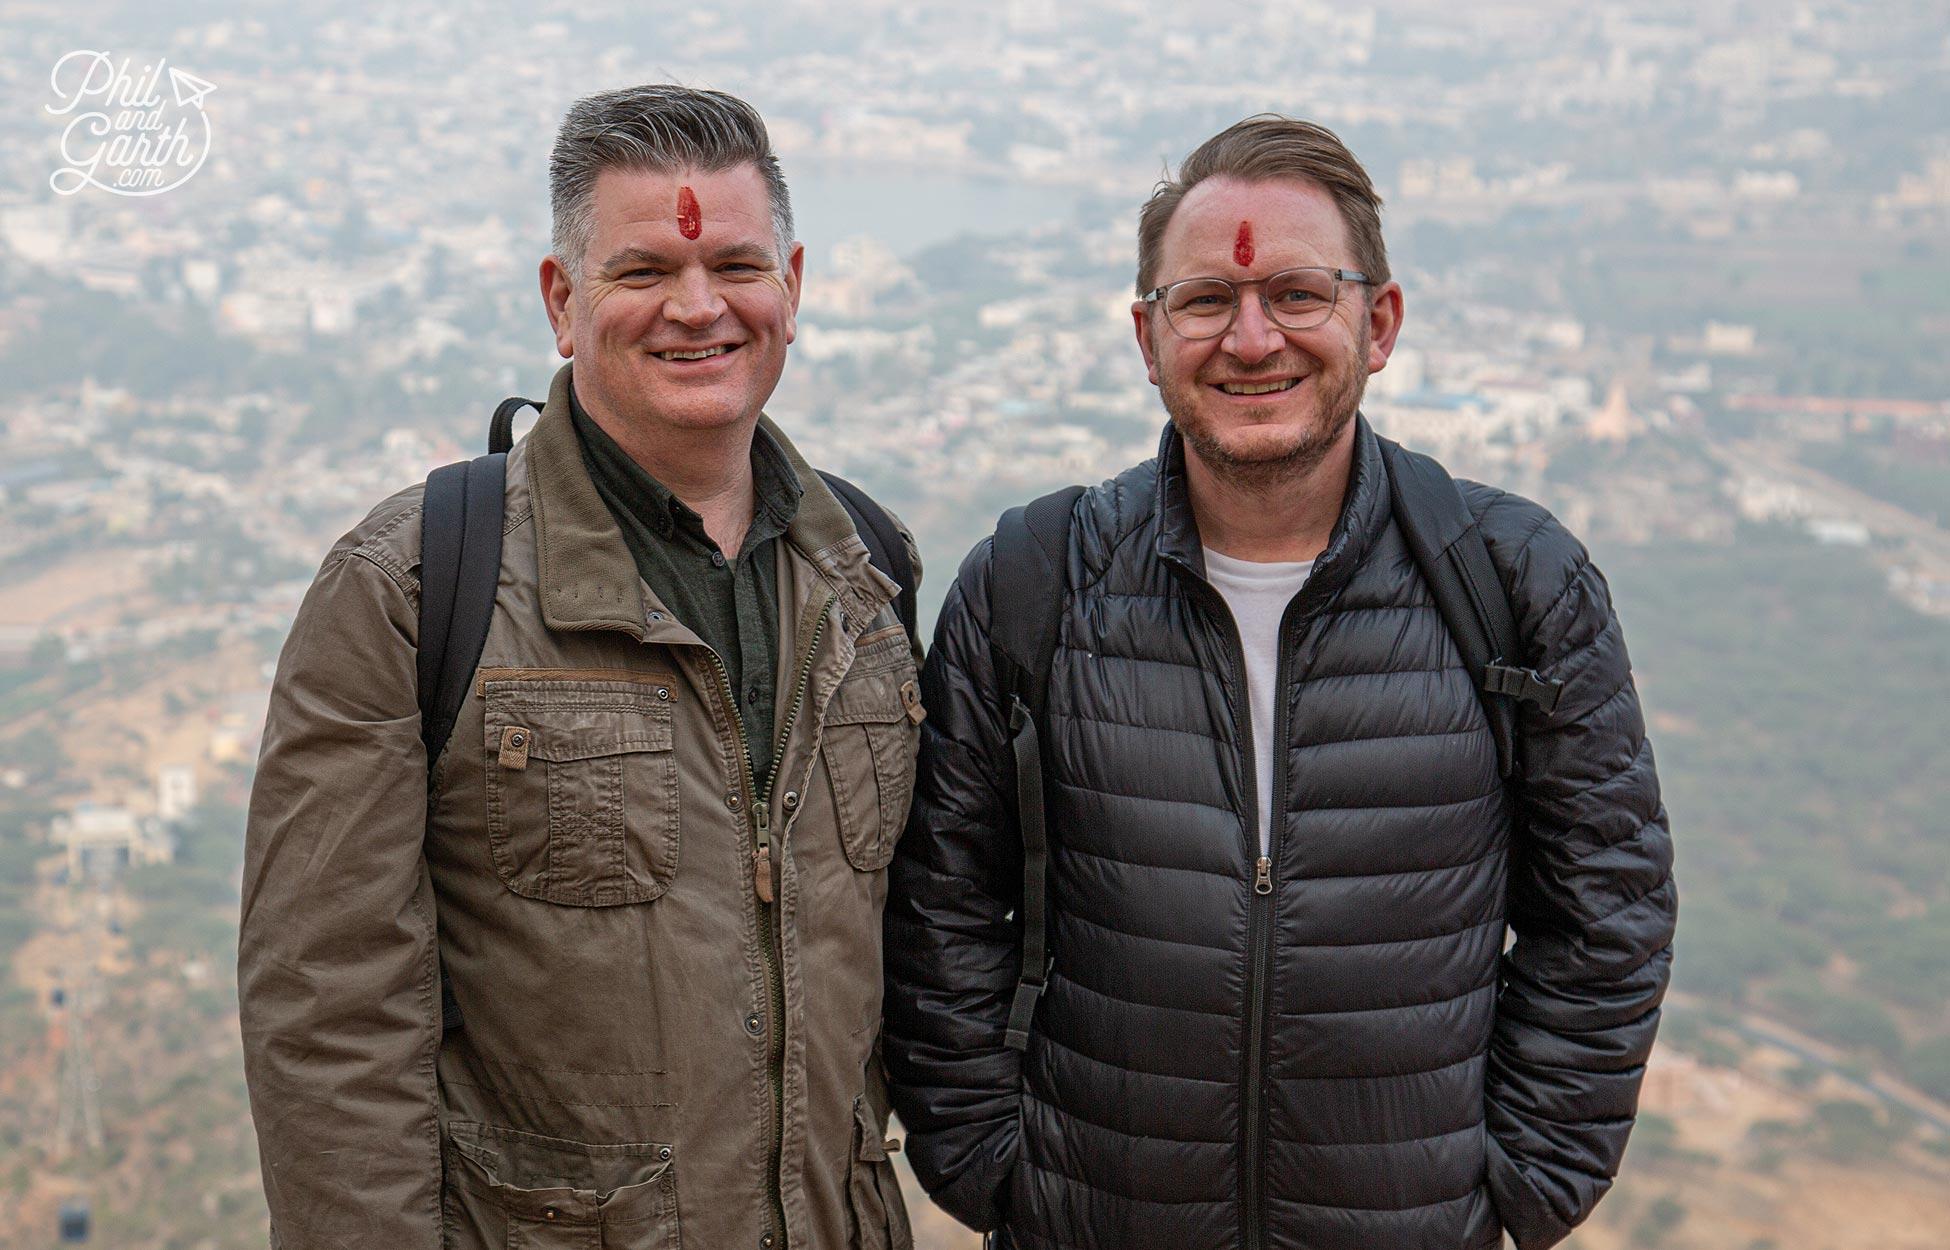 Phil and Garth's Top 5 Pushkar Tips